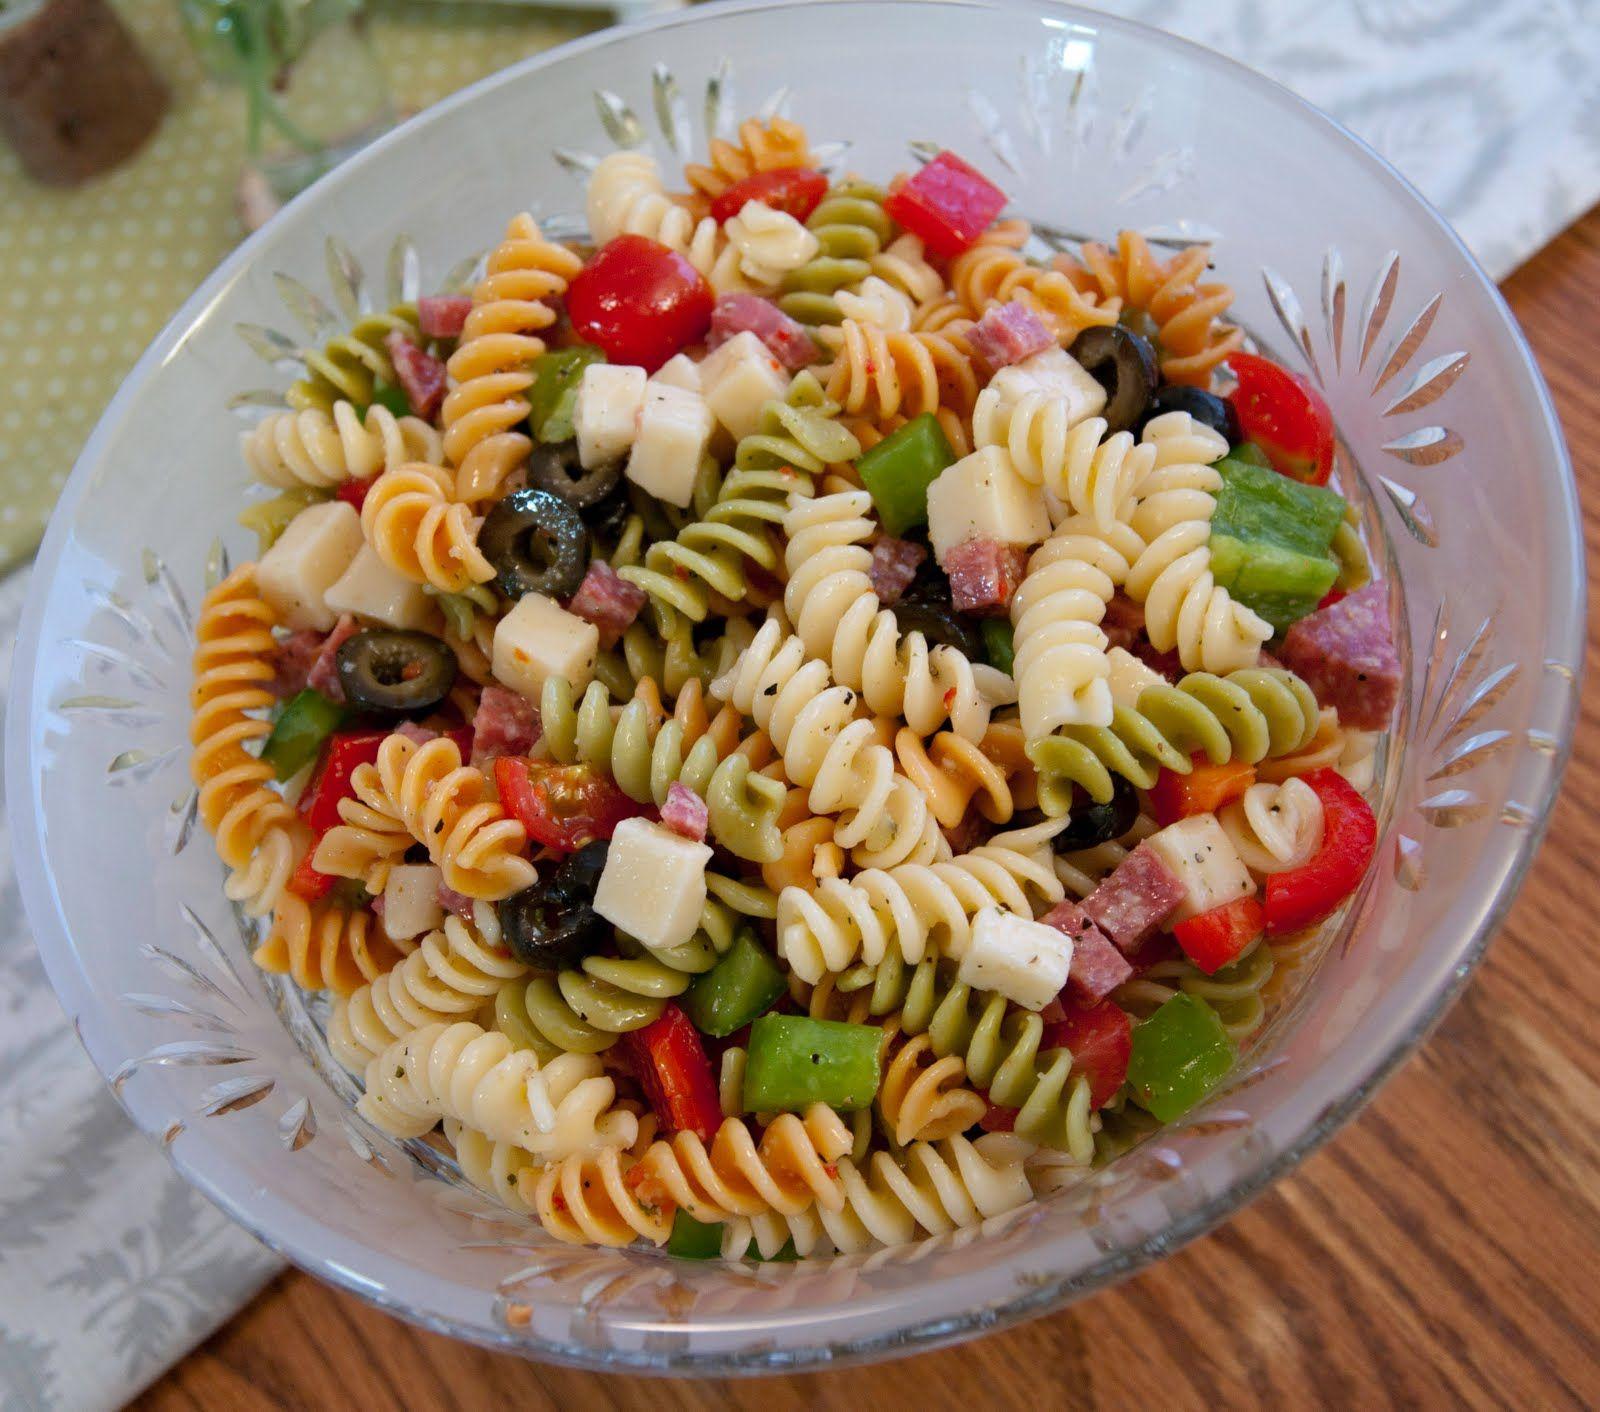 A Blog About Food My Favorite Pasta Salad Pasta Salad Italian Dressing Pasta Salad Italian Pasta Salad Recipe